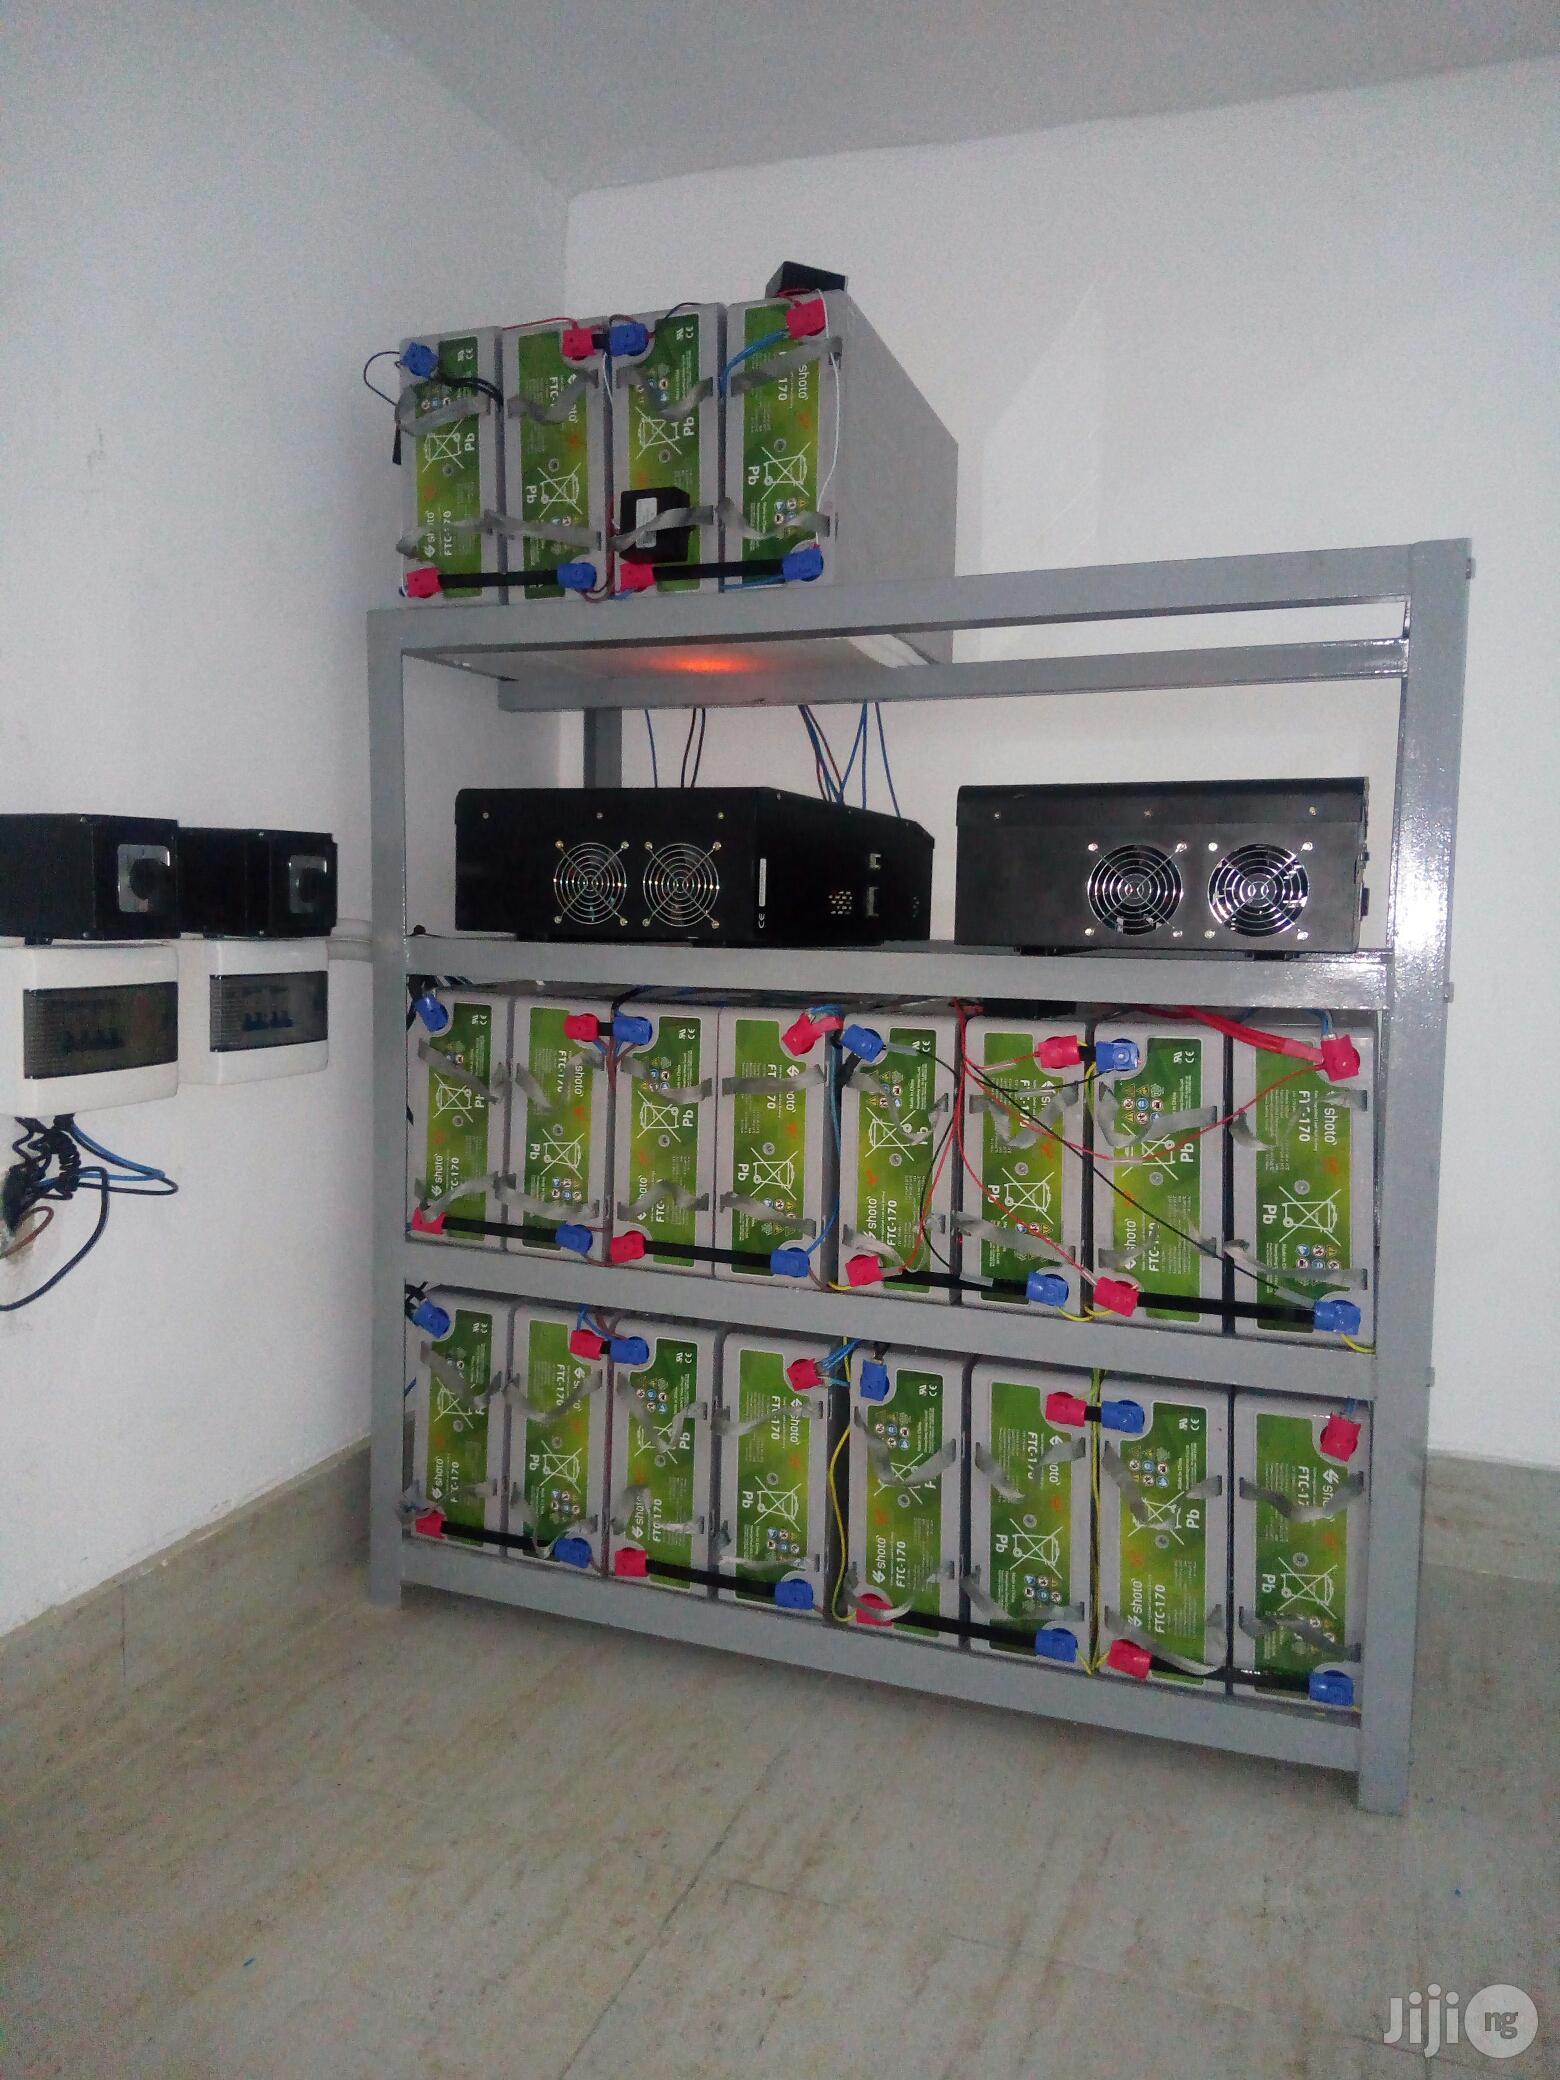 Archive: Jp2 Solar Hybrid Inverter Installation